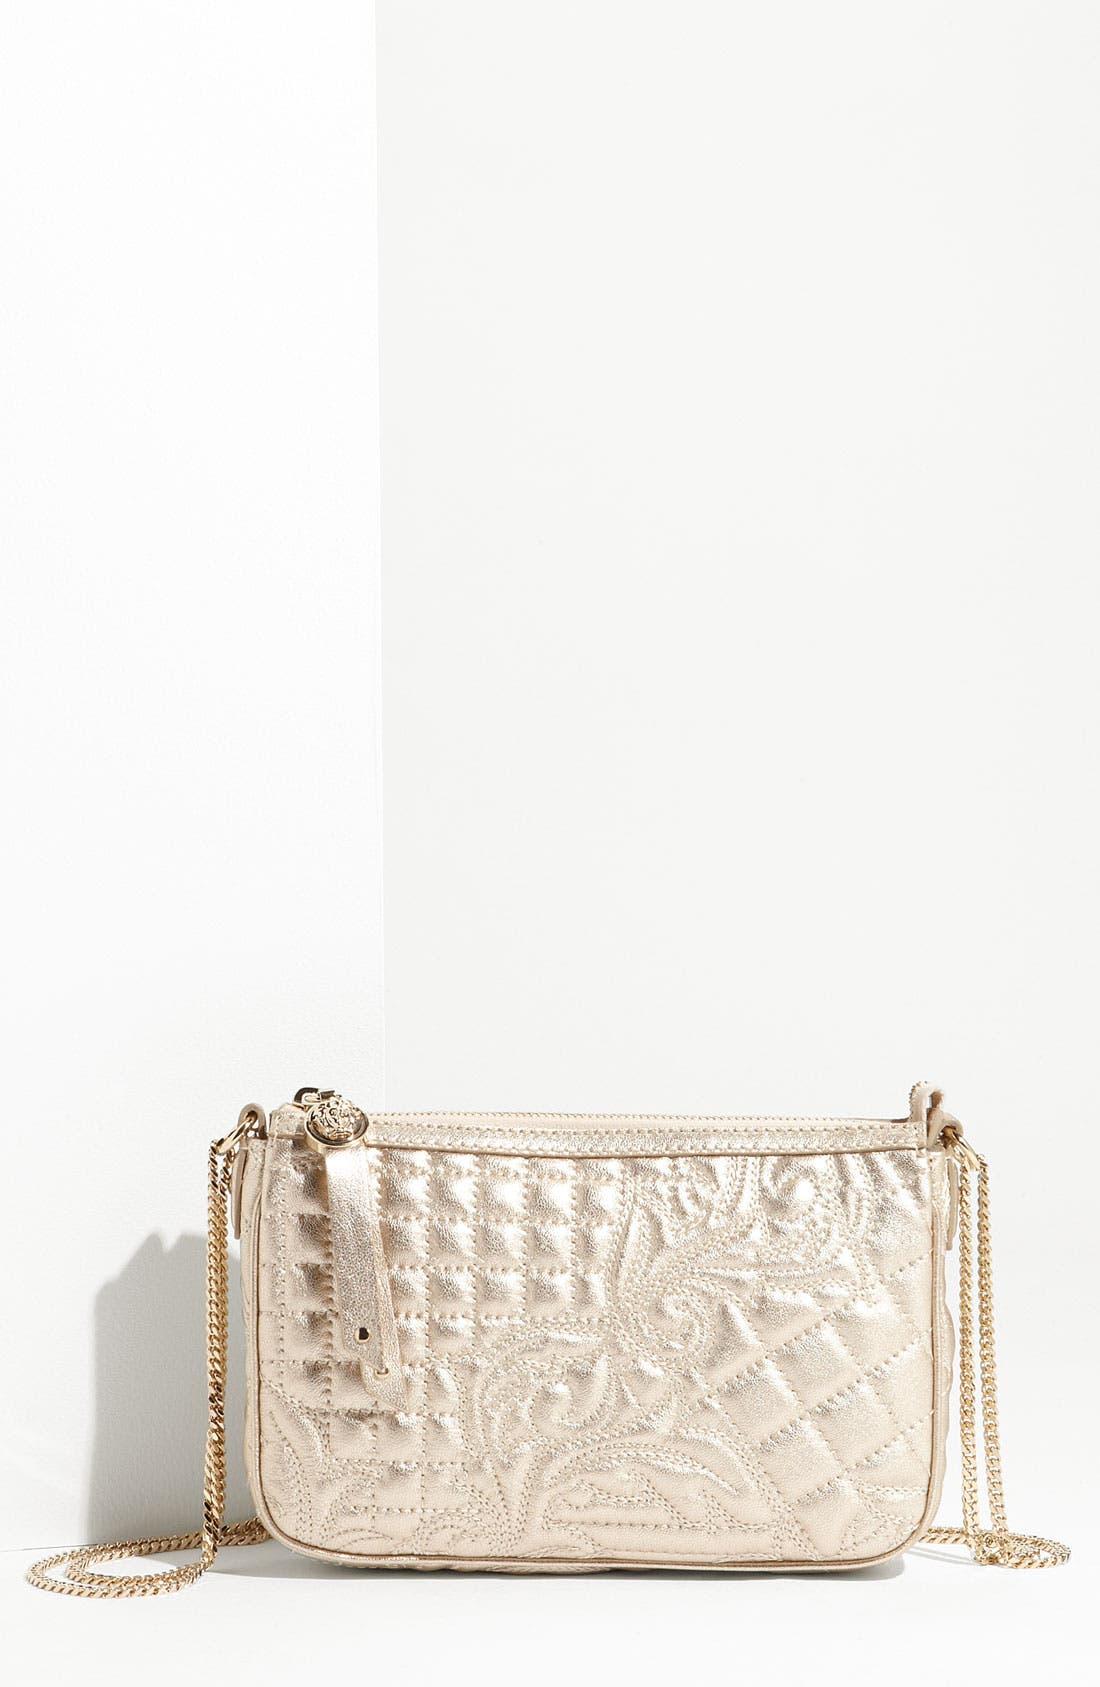 Alternate Image 1 Selected - Versace 'Vanitas' Embroidered Leather Crossbody Bag